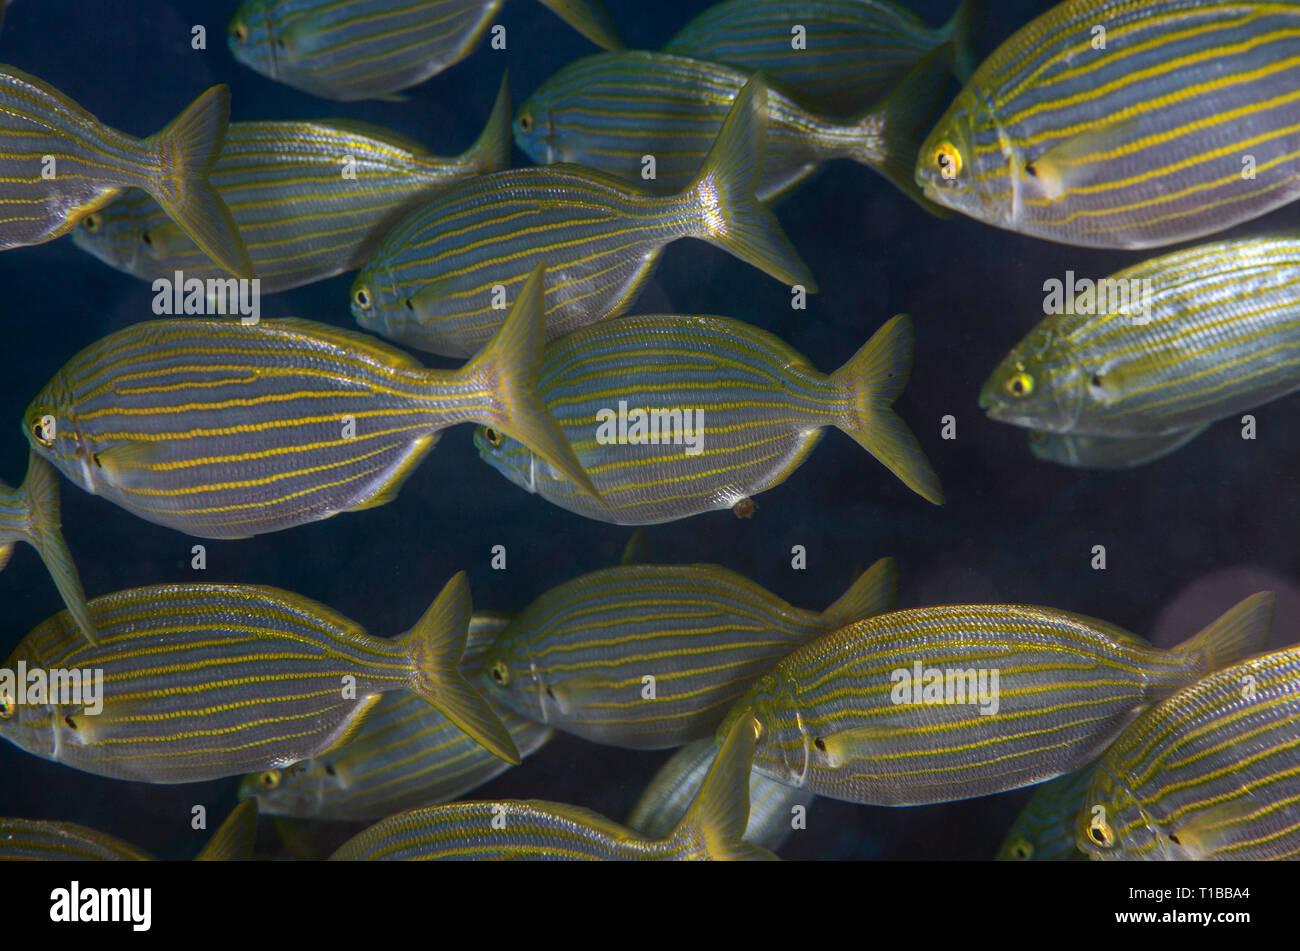 Salema, Sarpa sarpa, Sparidae, Tor Paterno Marine Protected Area, Rome, Italy, Mediterranean Sea - Stock Image